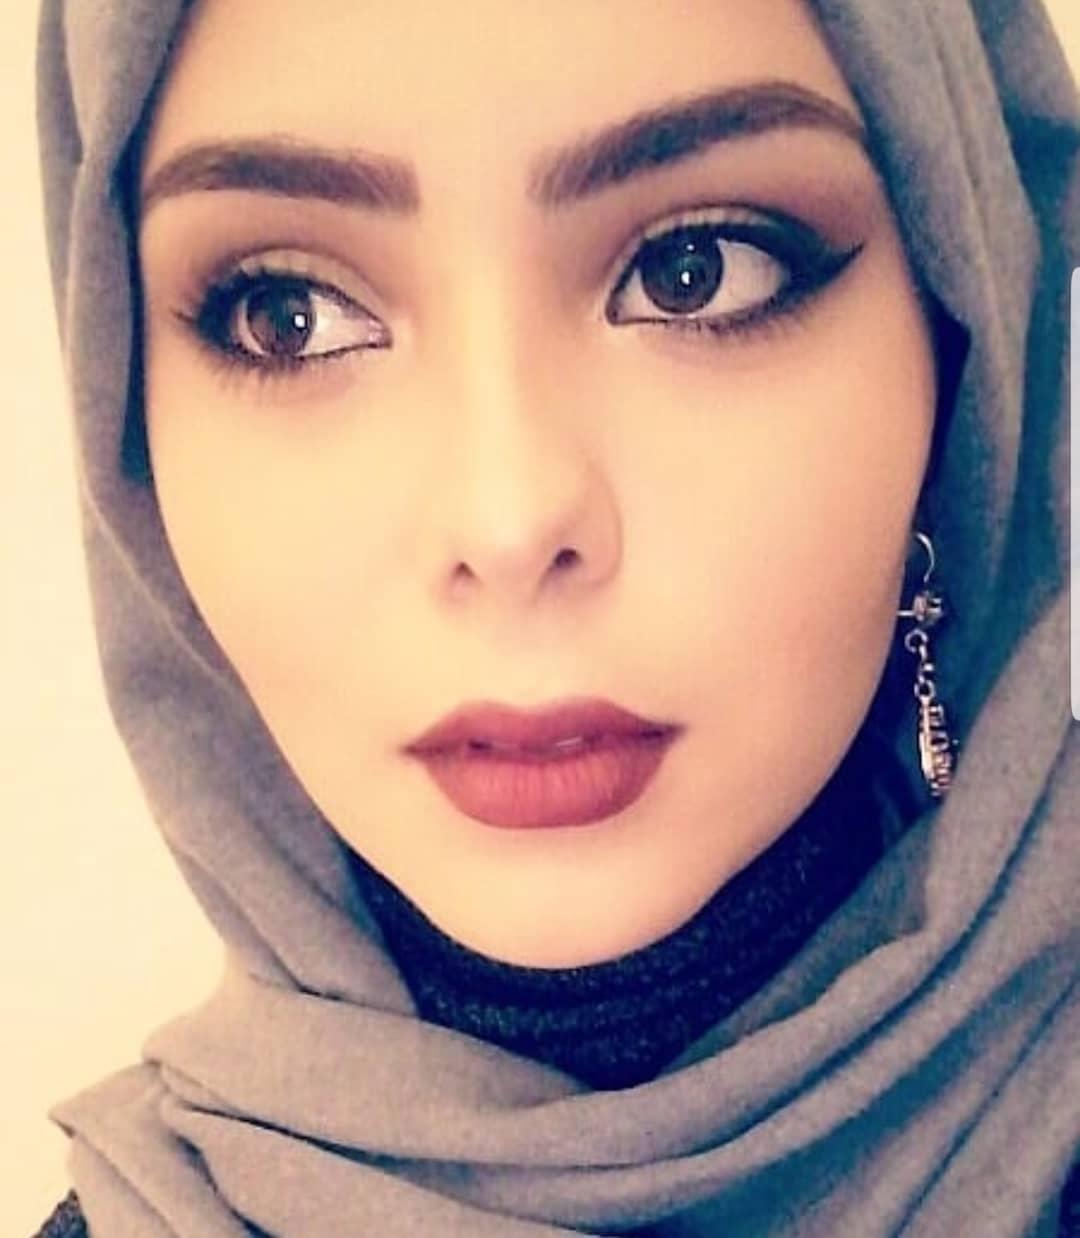 بالصور صور بنات محجبات 2019 , اجمل بروفيل لعاشقات الحجاب 1032 2